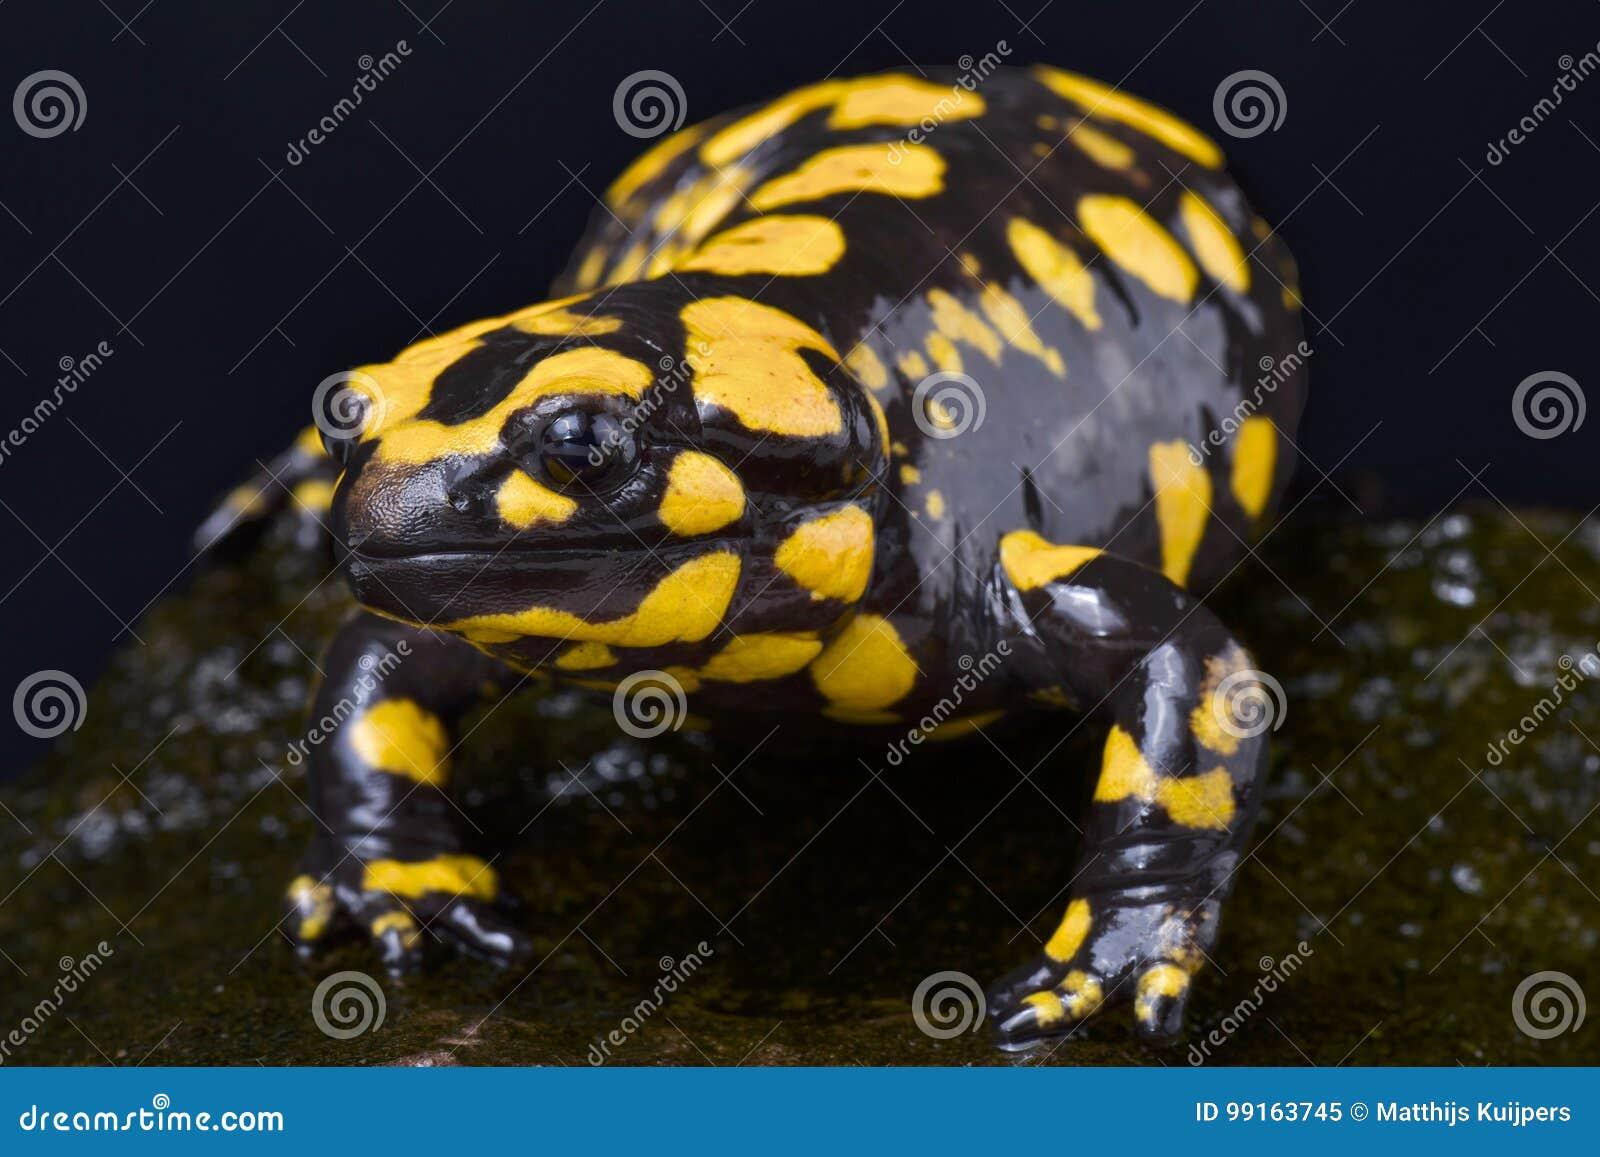 corsican fire salamander salamandra corsica stock image image of